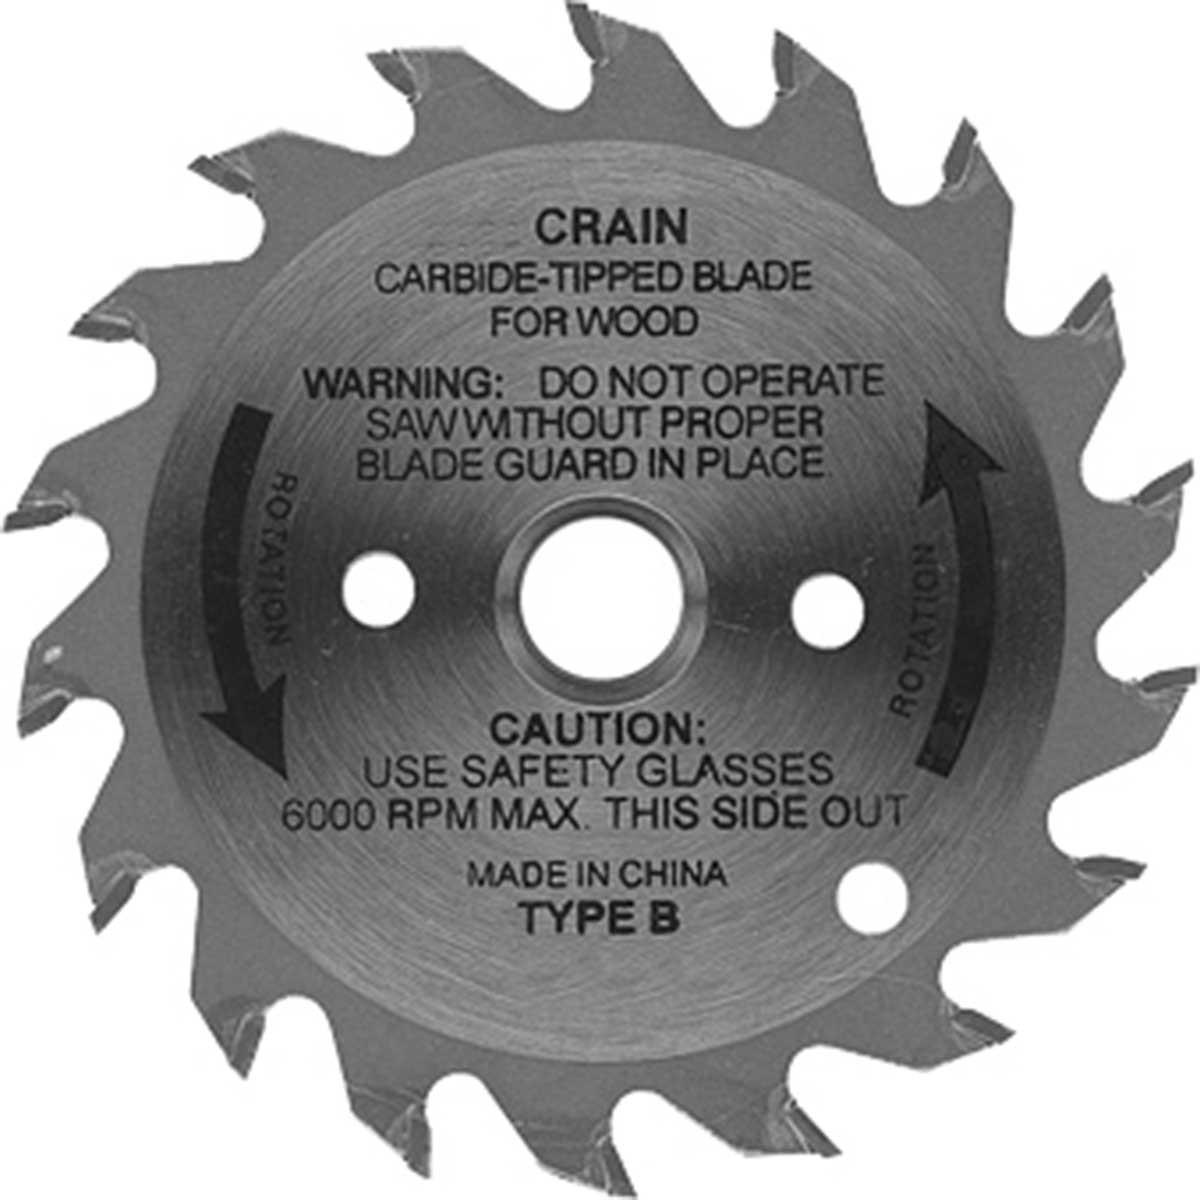 Crain Carbide Tipped Steel blade